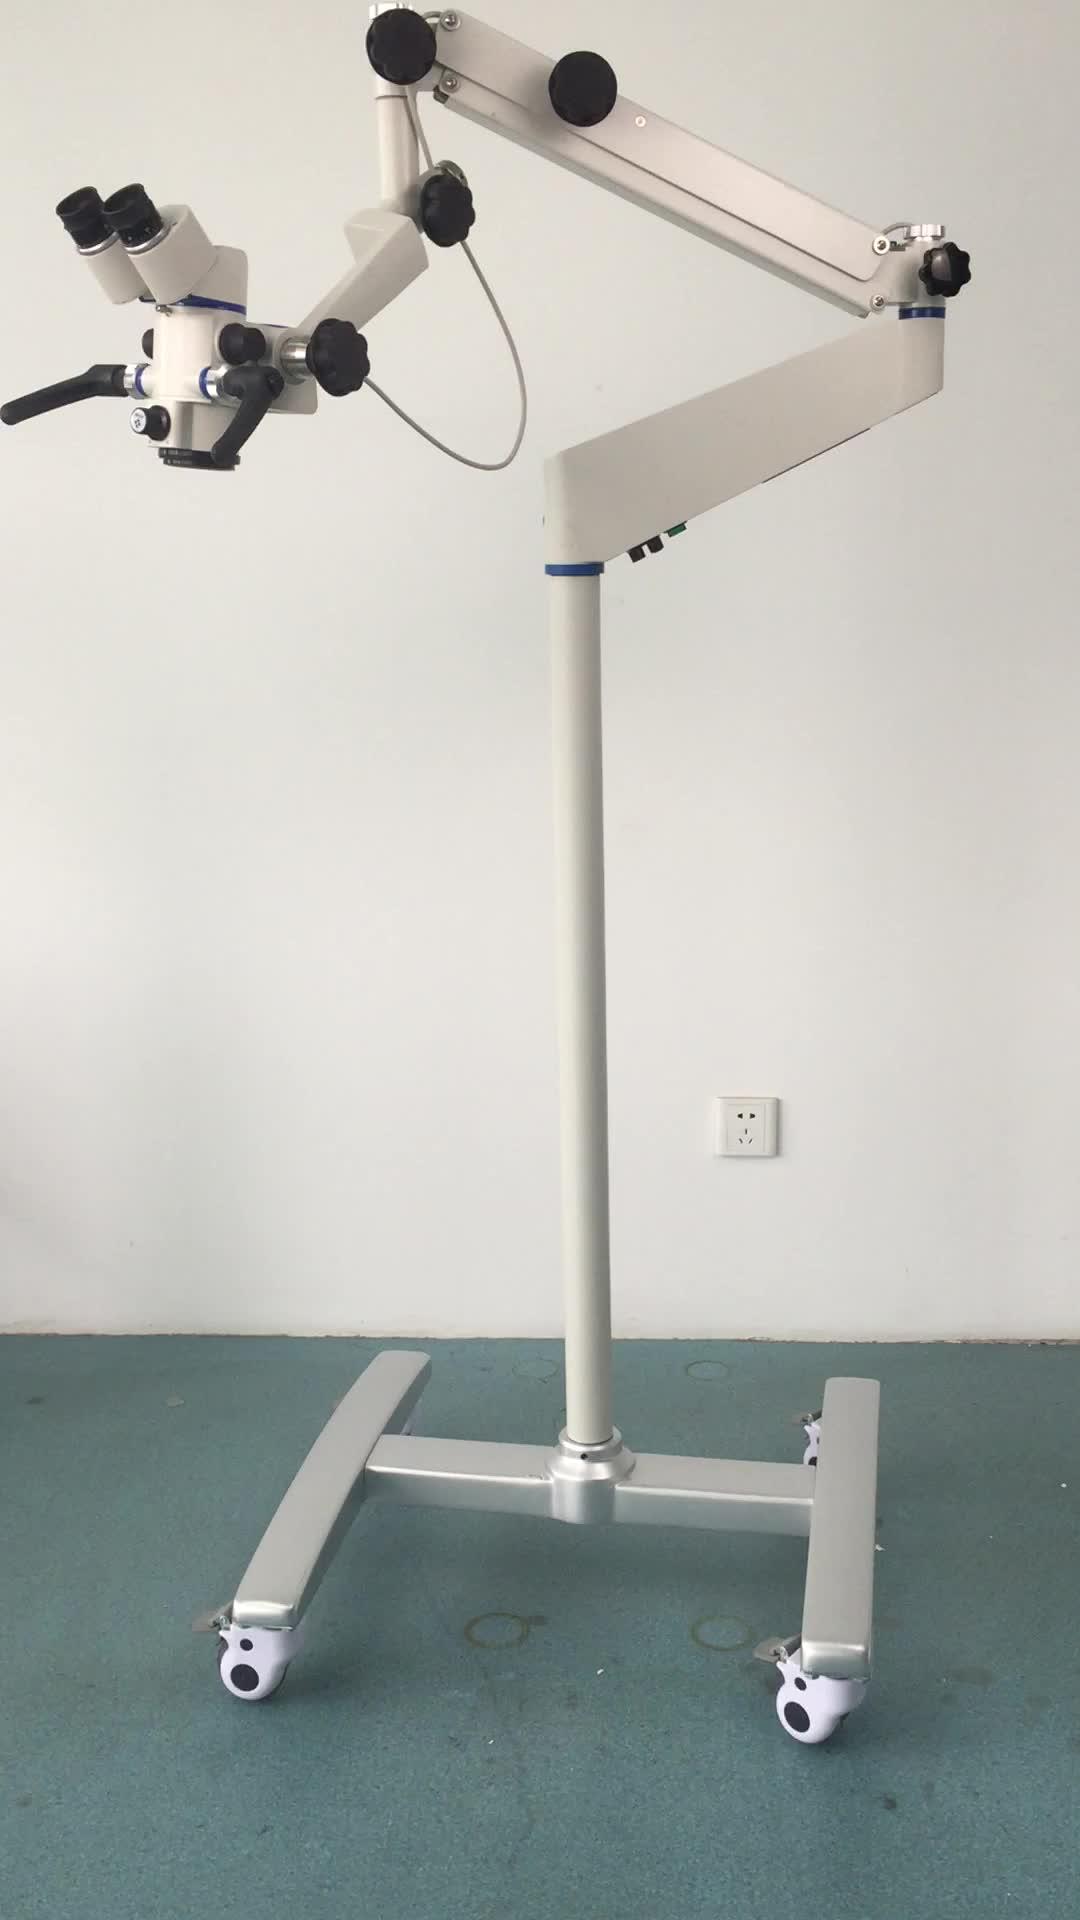 ASOM510 6A אוראלי טיפול ציוד ואבזרים maxilofacial ניתוח שיניים אופטיקה מיקרוסקופ